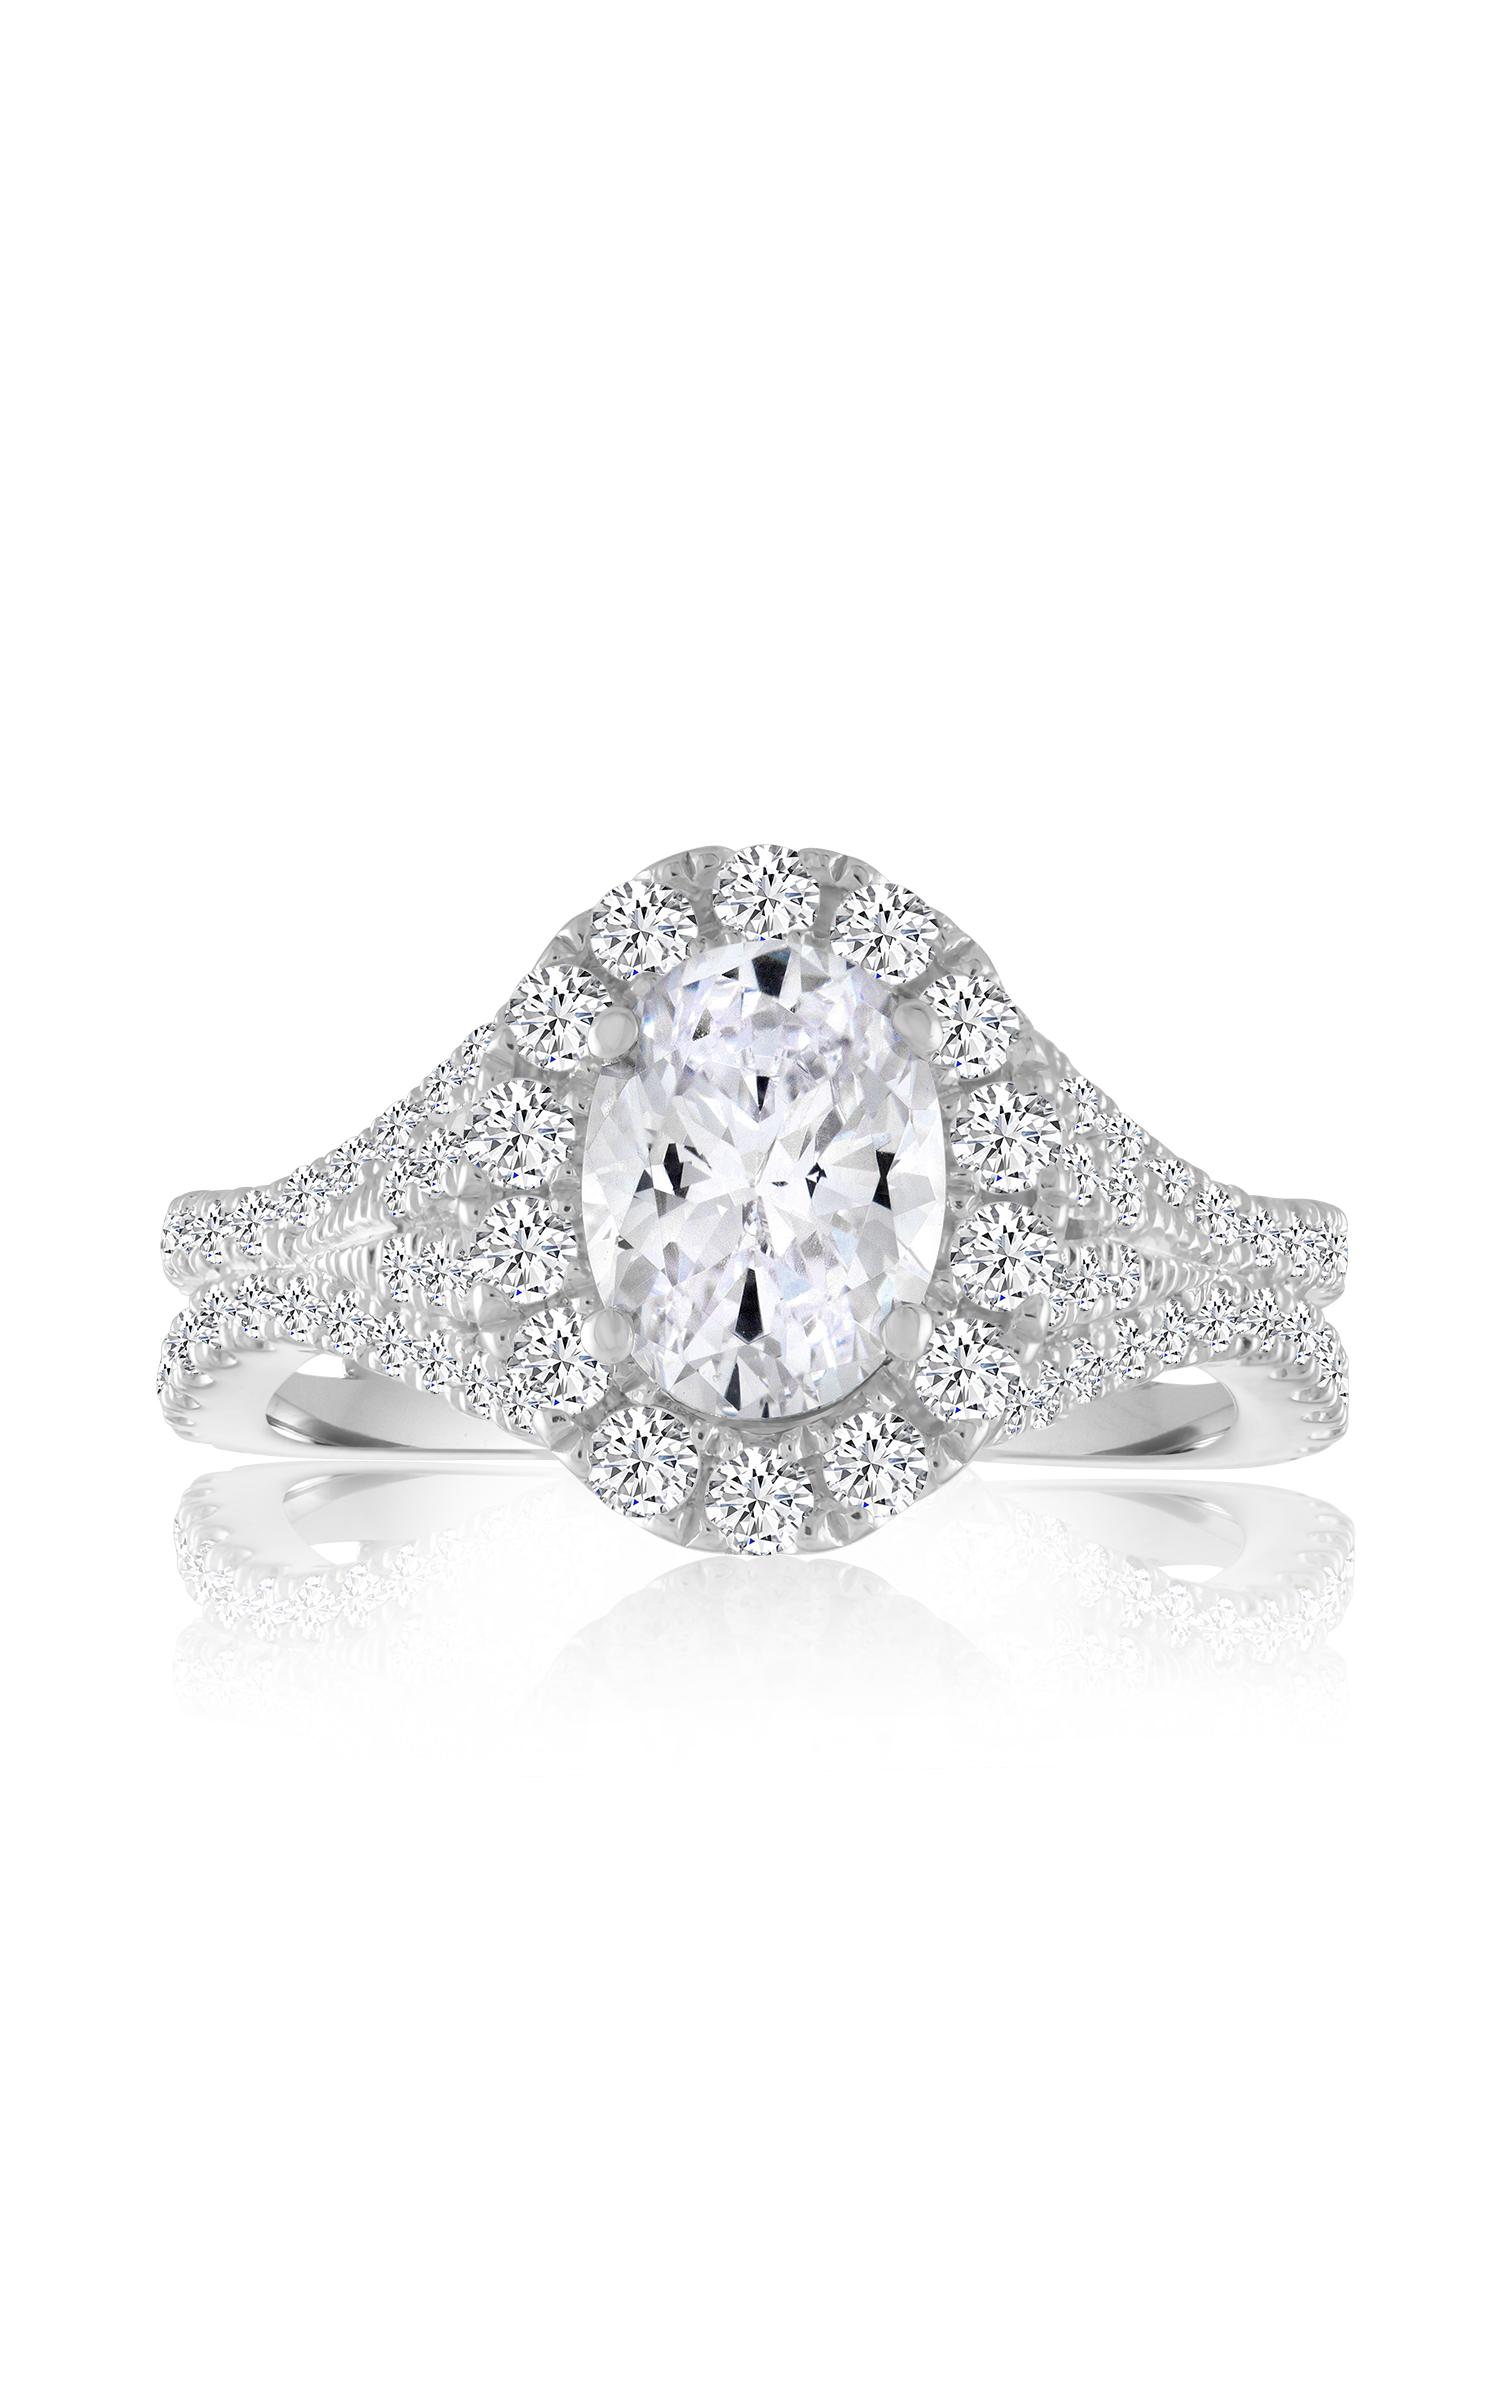 Imagine Bridal Engagement Ring 60102D-1 product image